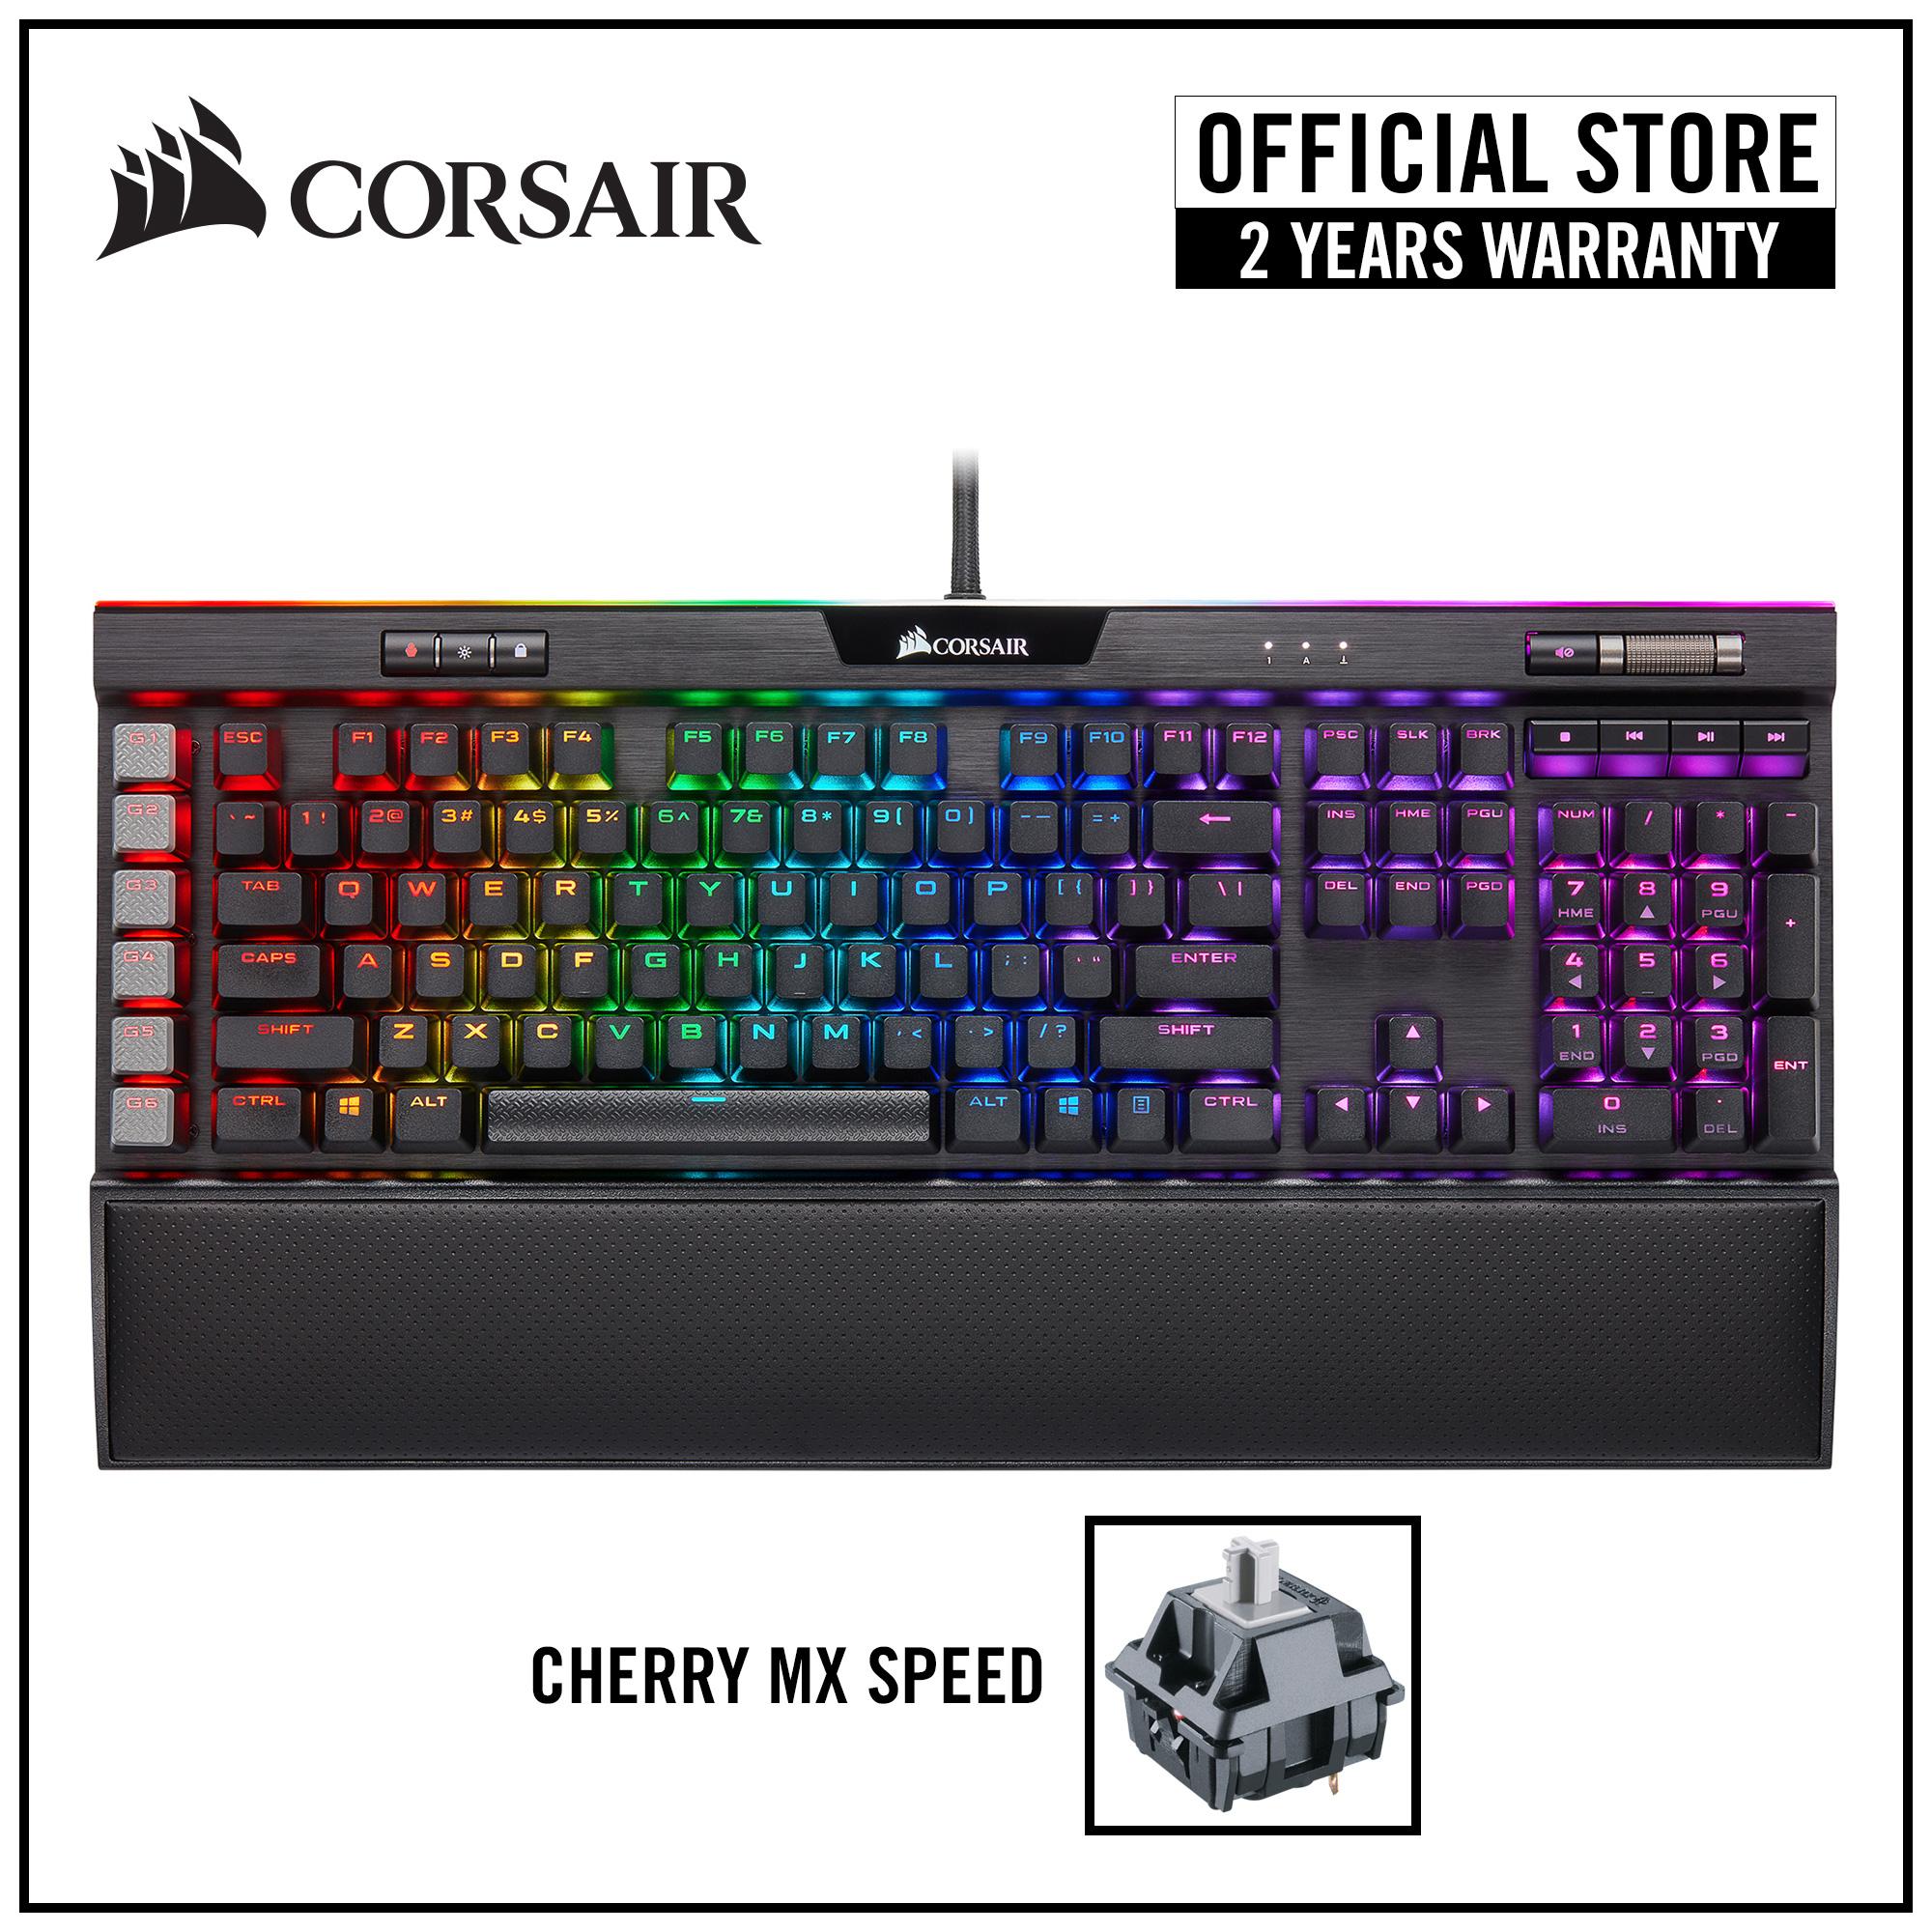 [NEW] CORSAIR K95 RGB PLATINUM XT Mechanical Gaming Keyboard (Black) — Cherry MX Speed RGB Singapore